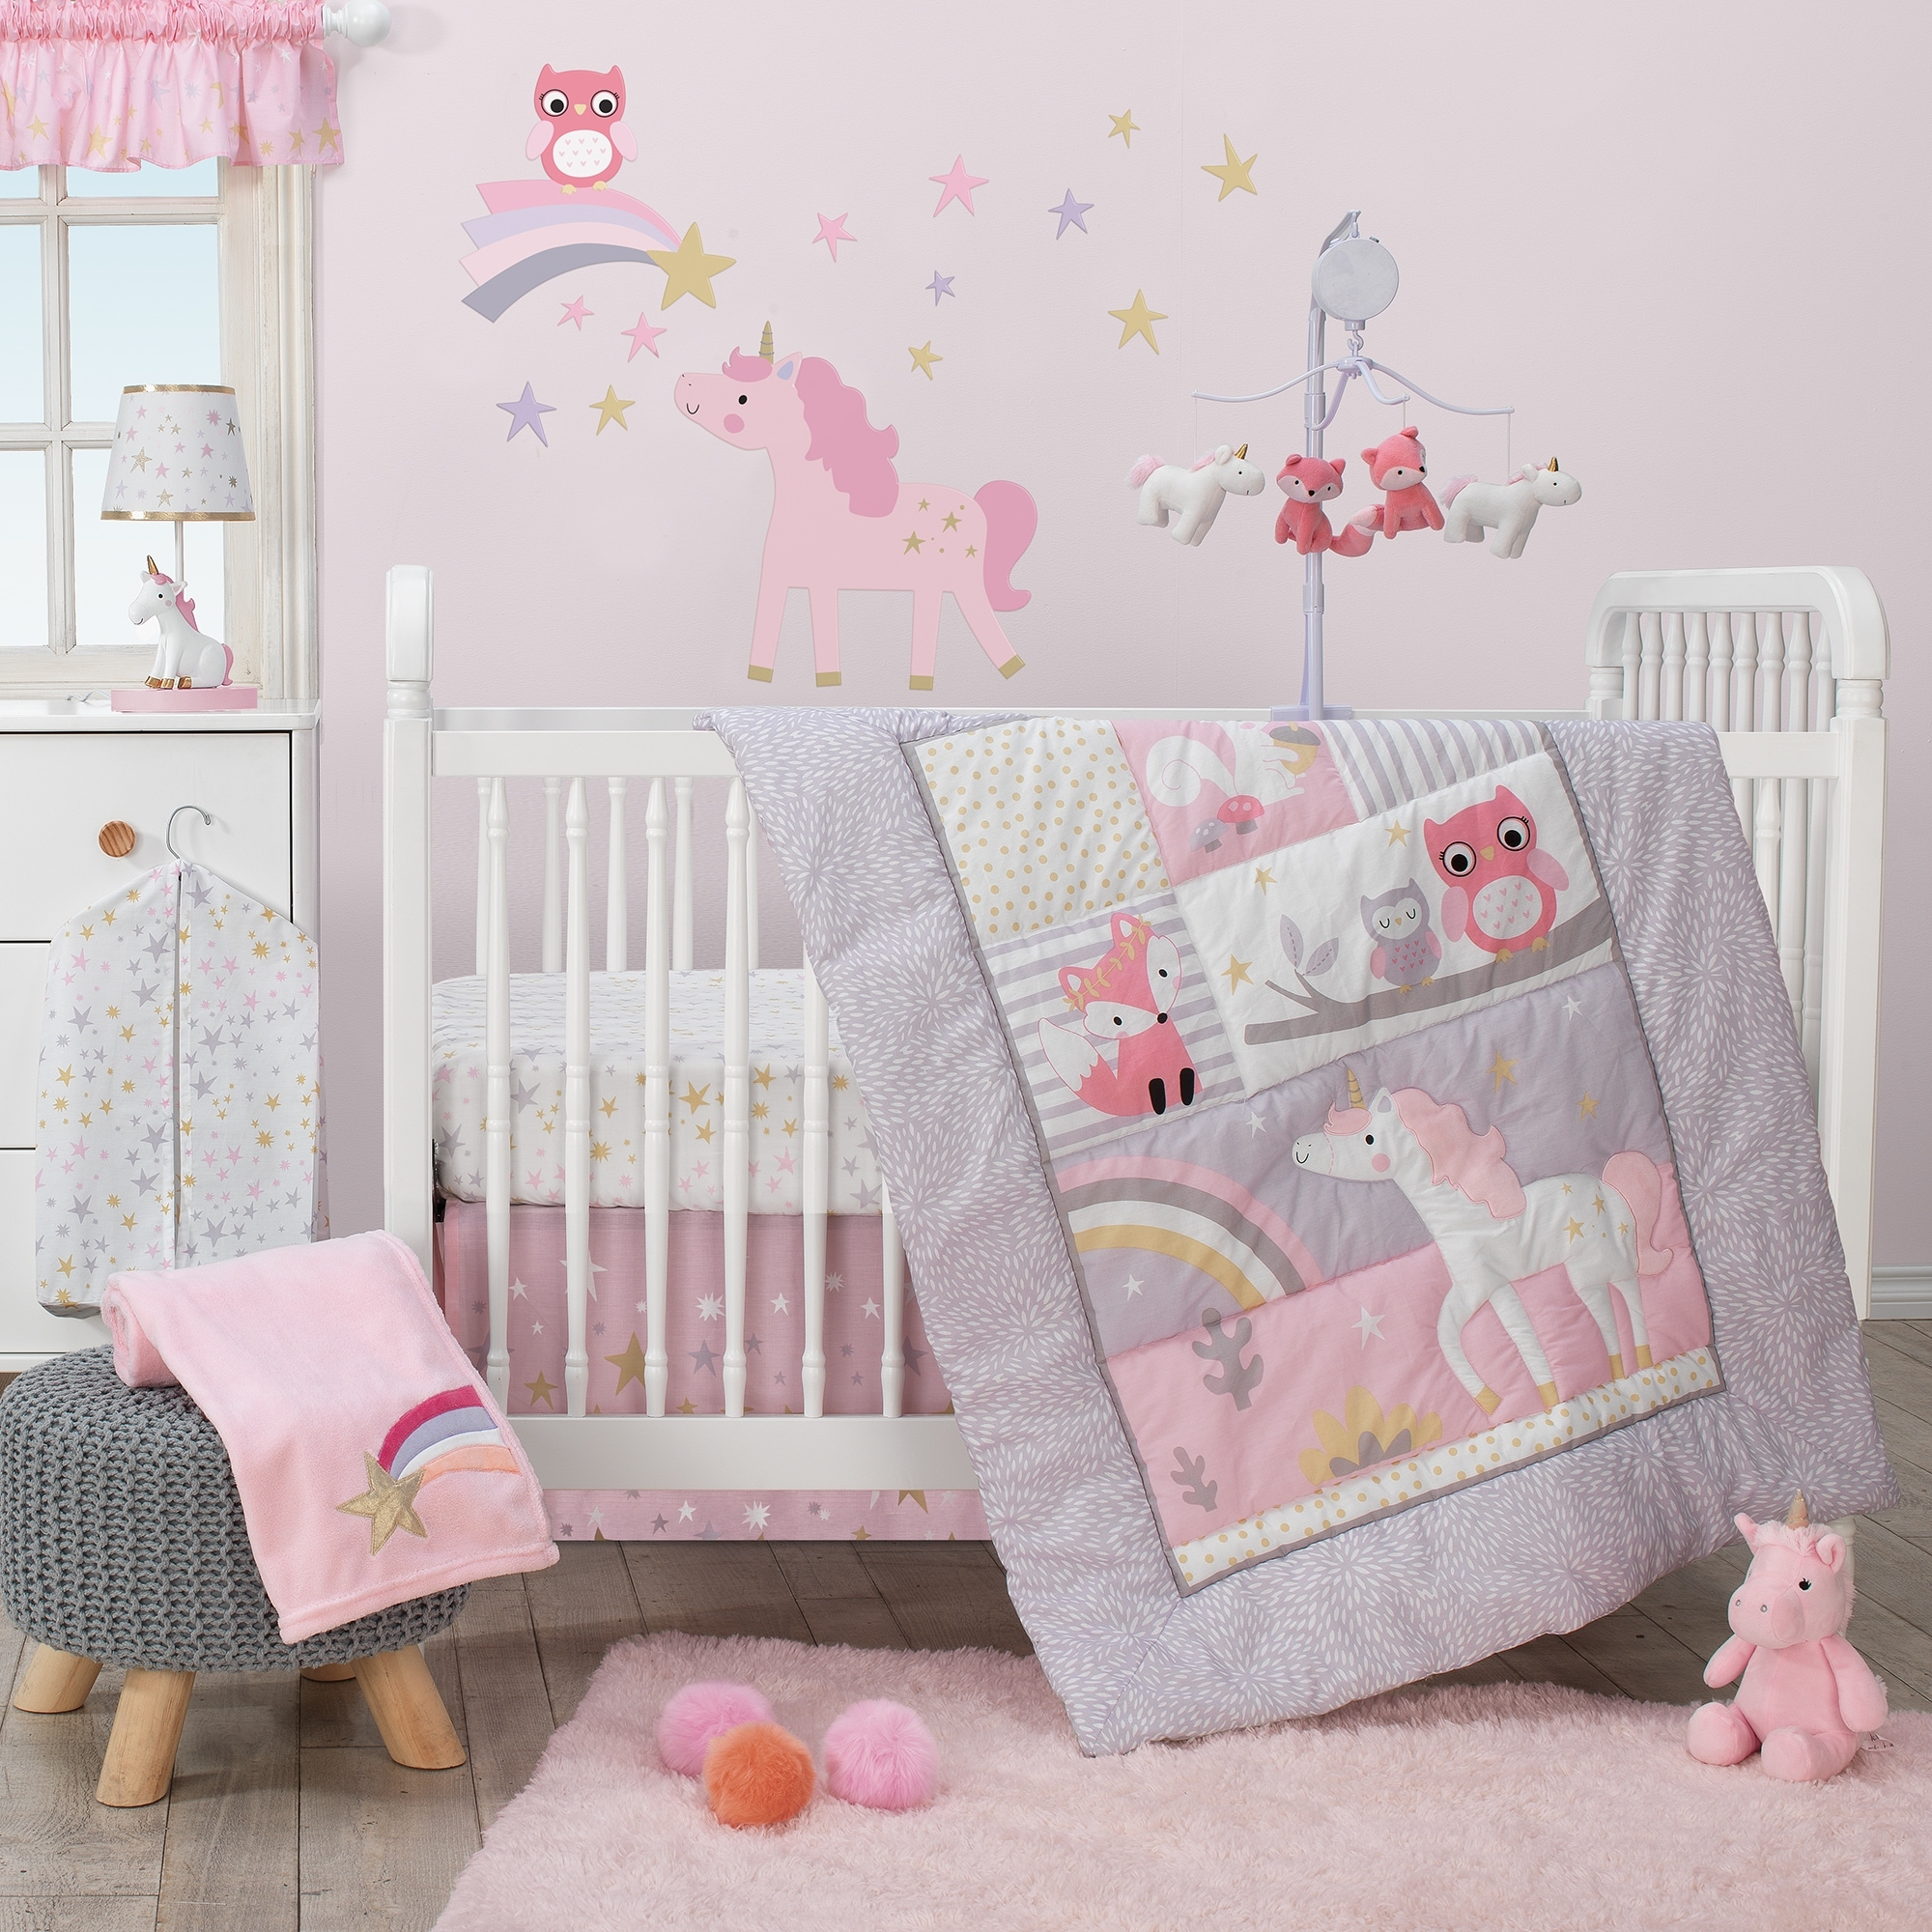 Bedtime Originals Rainbow Unicorn With Fox Squirrel And Owls Pink Purple 3 Piece Baby Nursery Crib Bedding Set